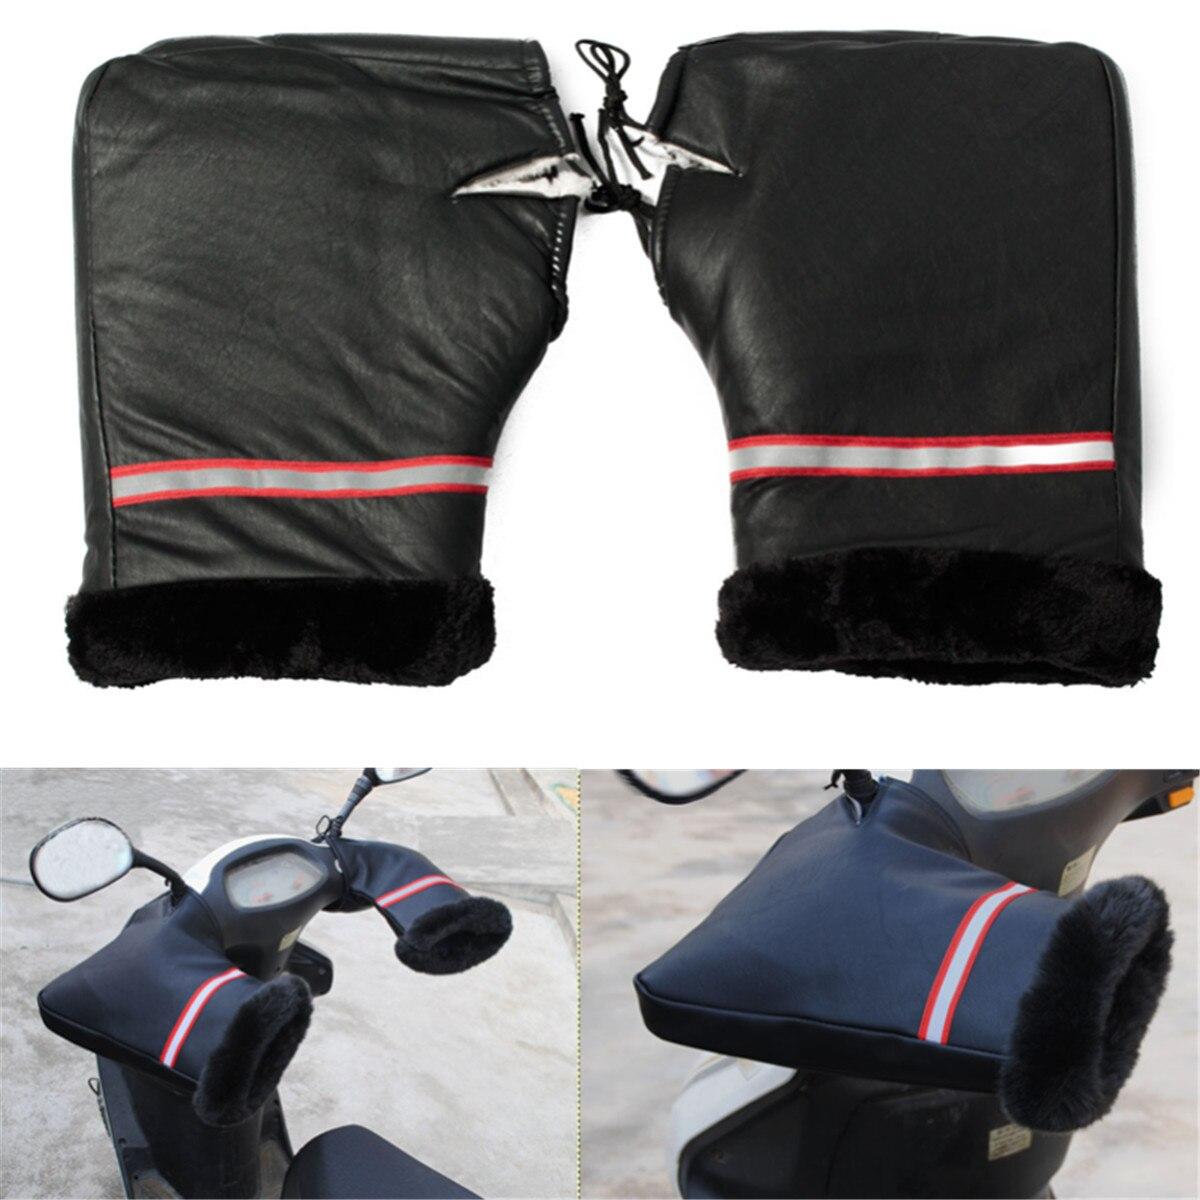 Waterproof Windproof Winter Warm Motorcycle Scooter Quad Bike Grip HandleBar Hand Cover Glove Handlebar Fur Muffs Glove